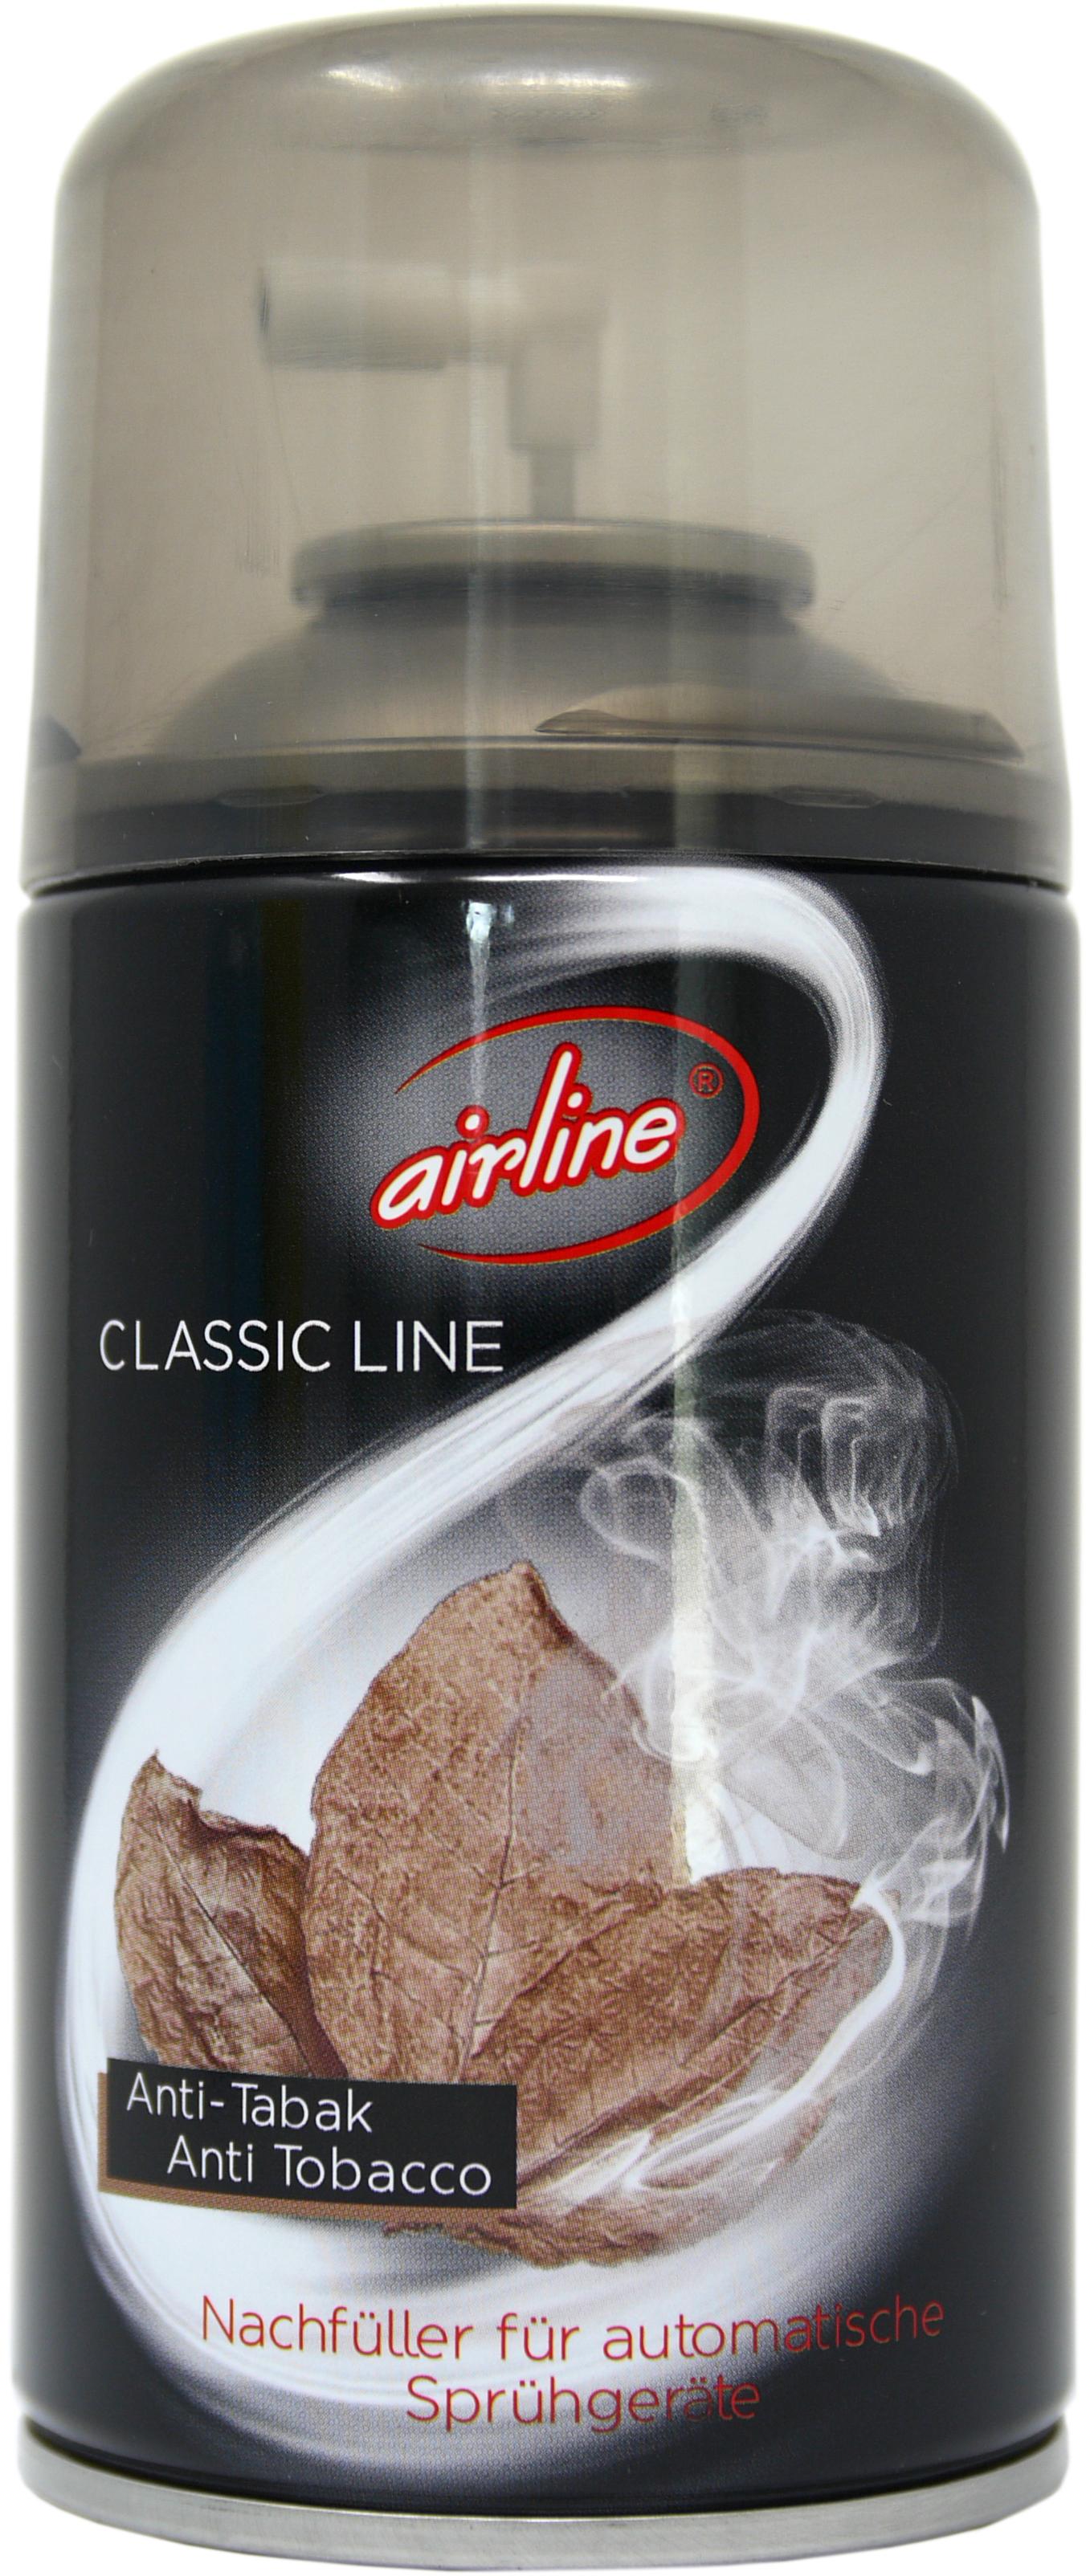 00501 - airline Classic Line Anti Tabacco Nachfüllkartusche 250 ml